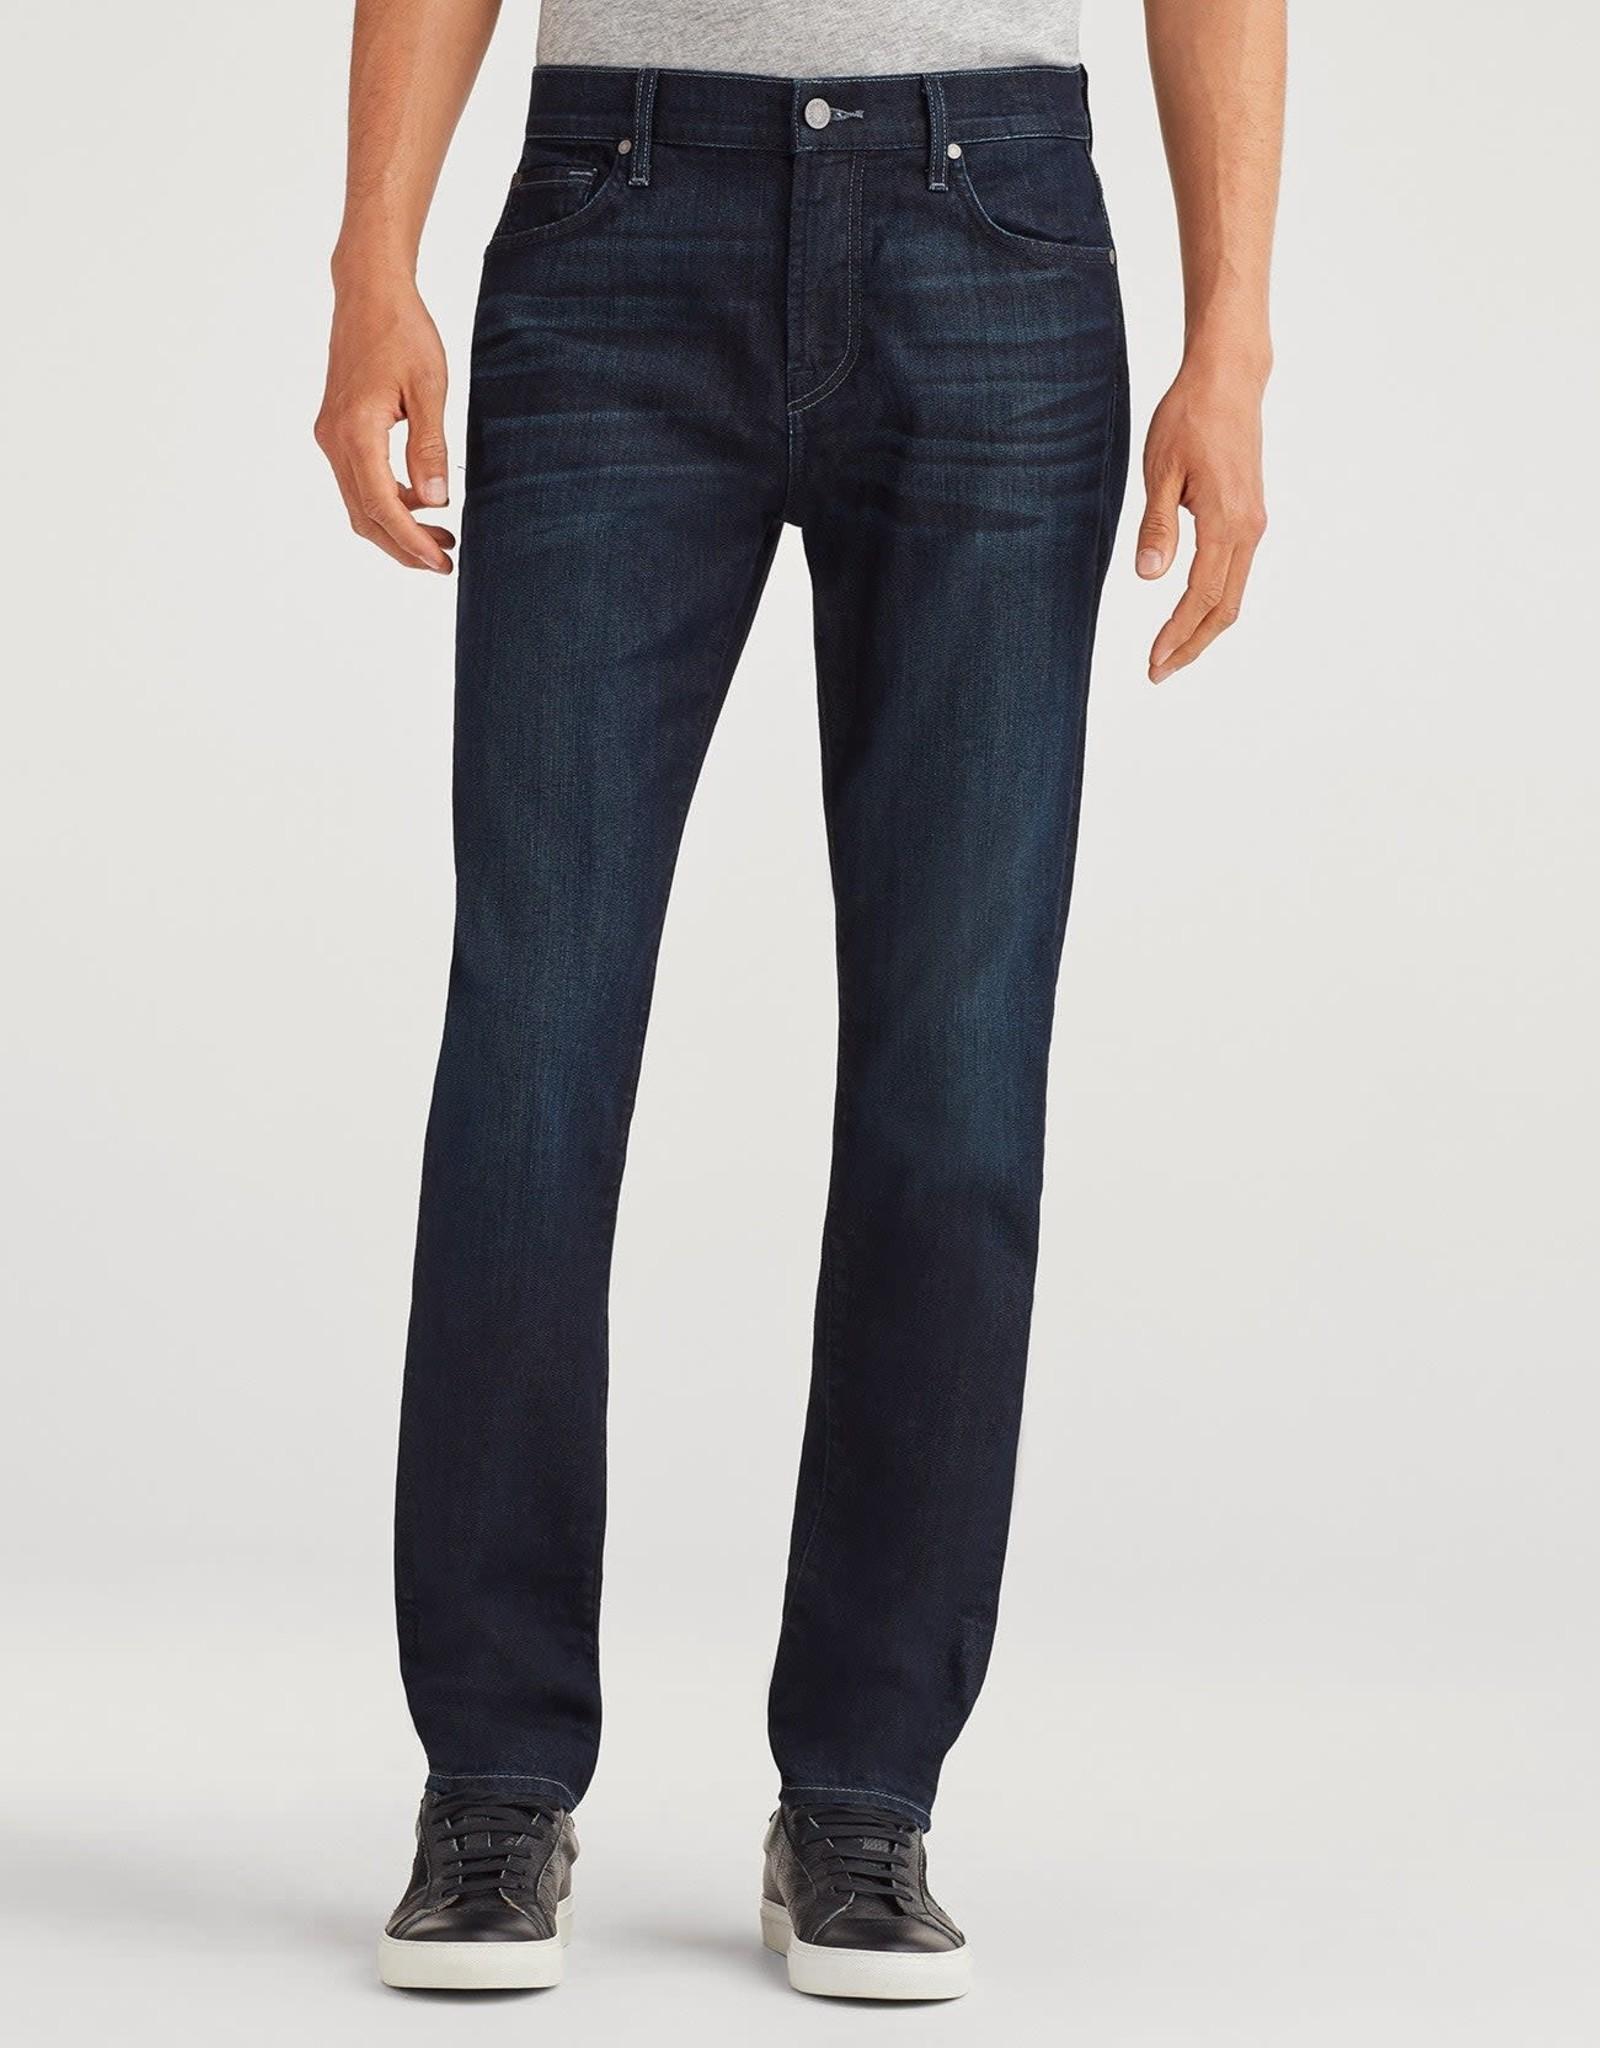 7 For All Mankind Adrien Slim Clean Pkt Jean